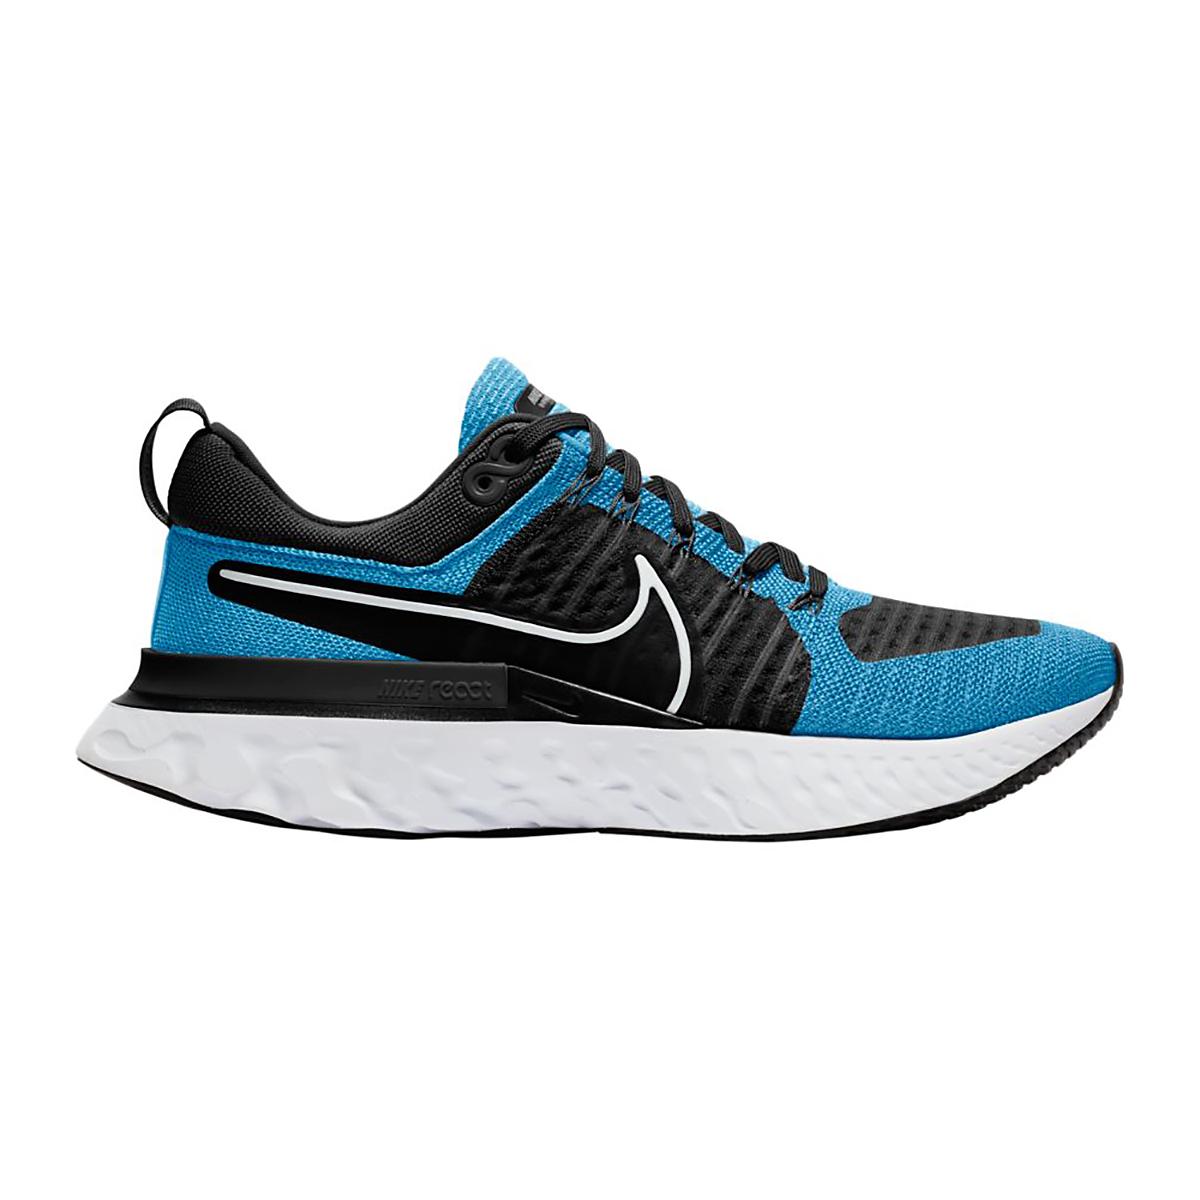 Men's Nike React Infinity Run Flyknit 2 Running Shoe - Color: Blue Orbit/White - Size: 8 - Width: Regular, Blue Orbit/White, large, image 1